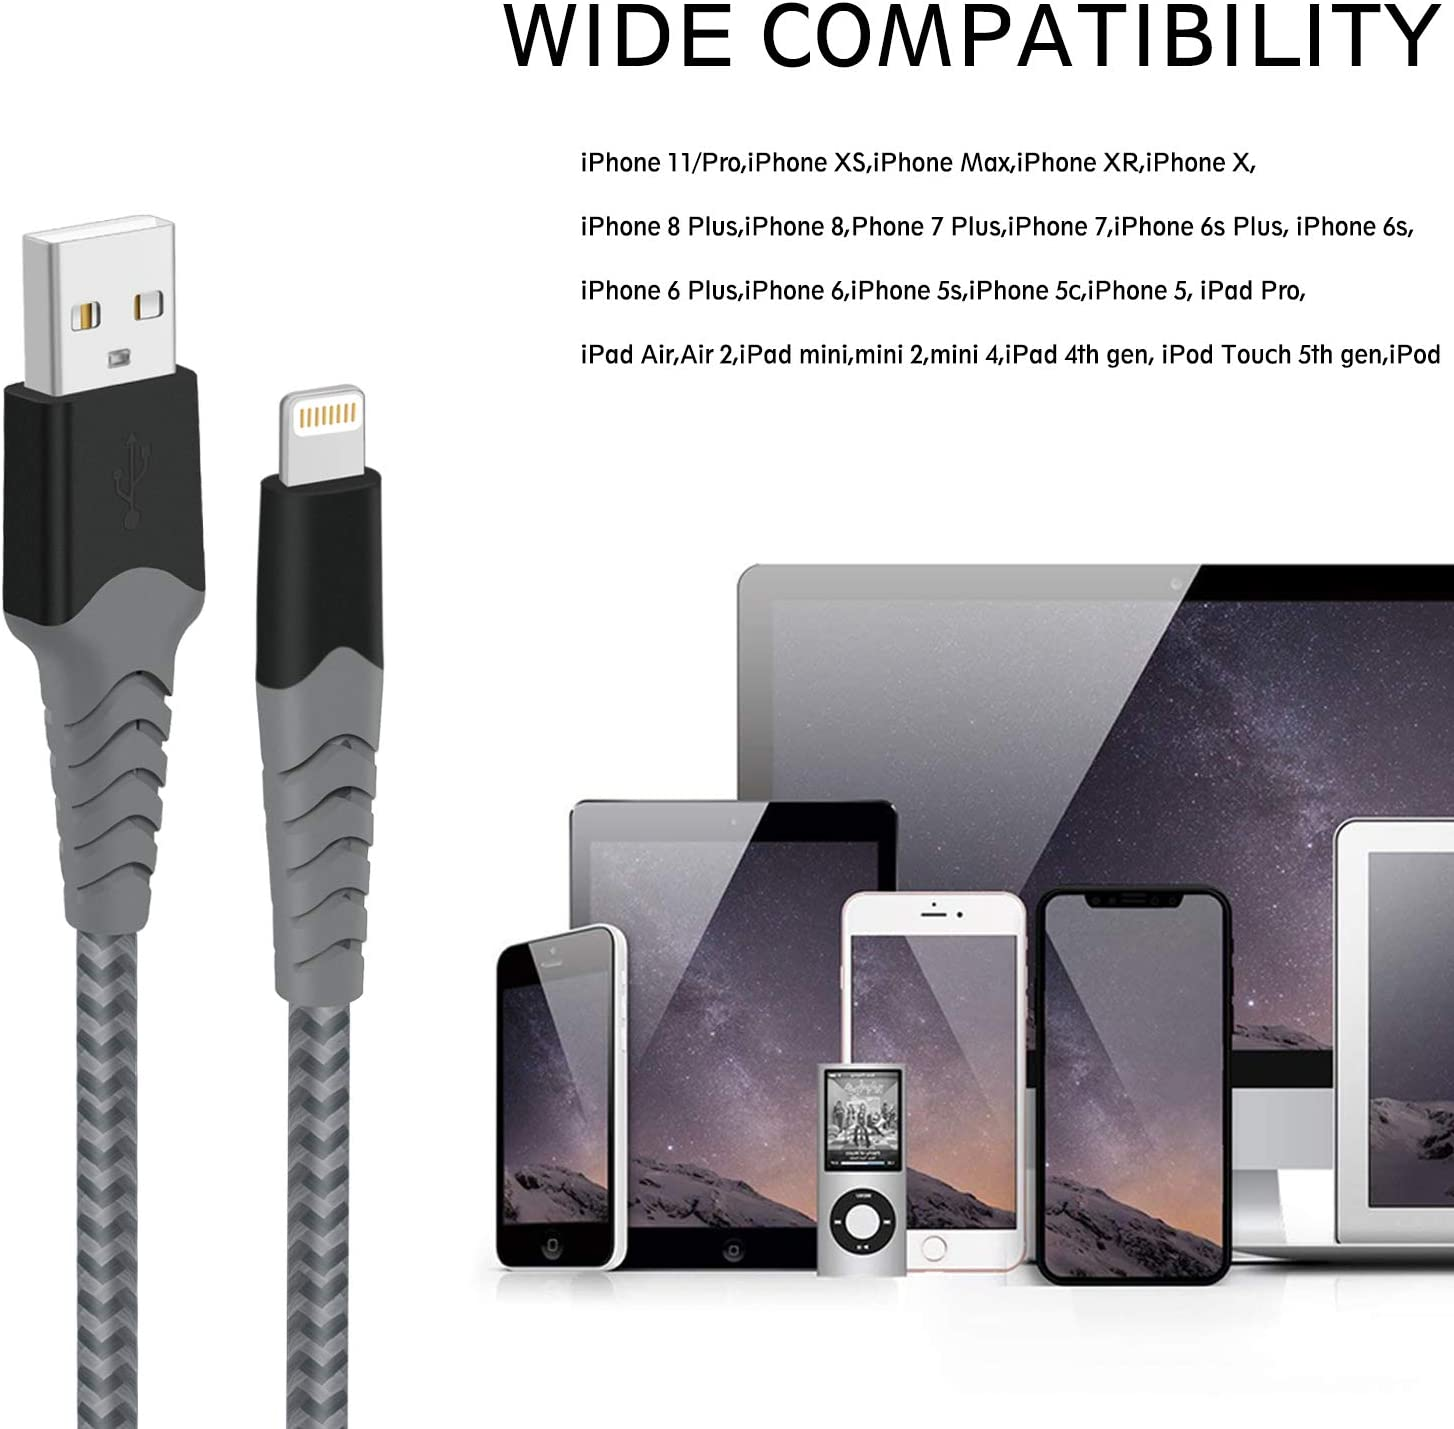 Wingstime iPhone Ladekabel Lightning Kabel 3 St/ück 2m USB Ladekabel Schnellladung Nylon iPhone Kabel Compatible with iPhone X XR XS 11 10 8 8 Plus 7 7 Plus 6 6S 6S Plus 5S 5 SE iPad